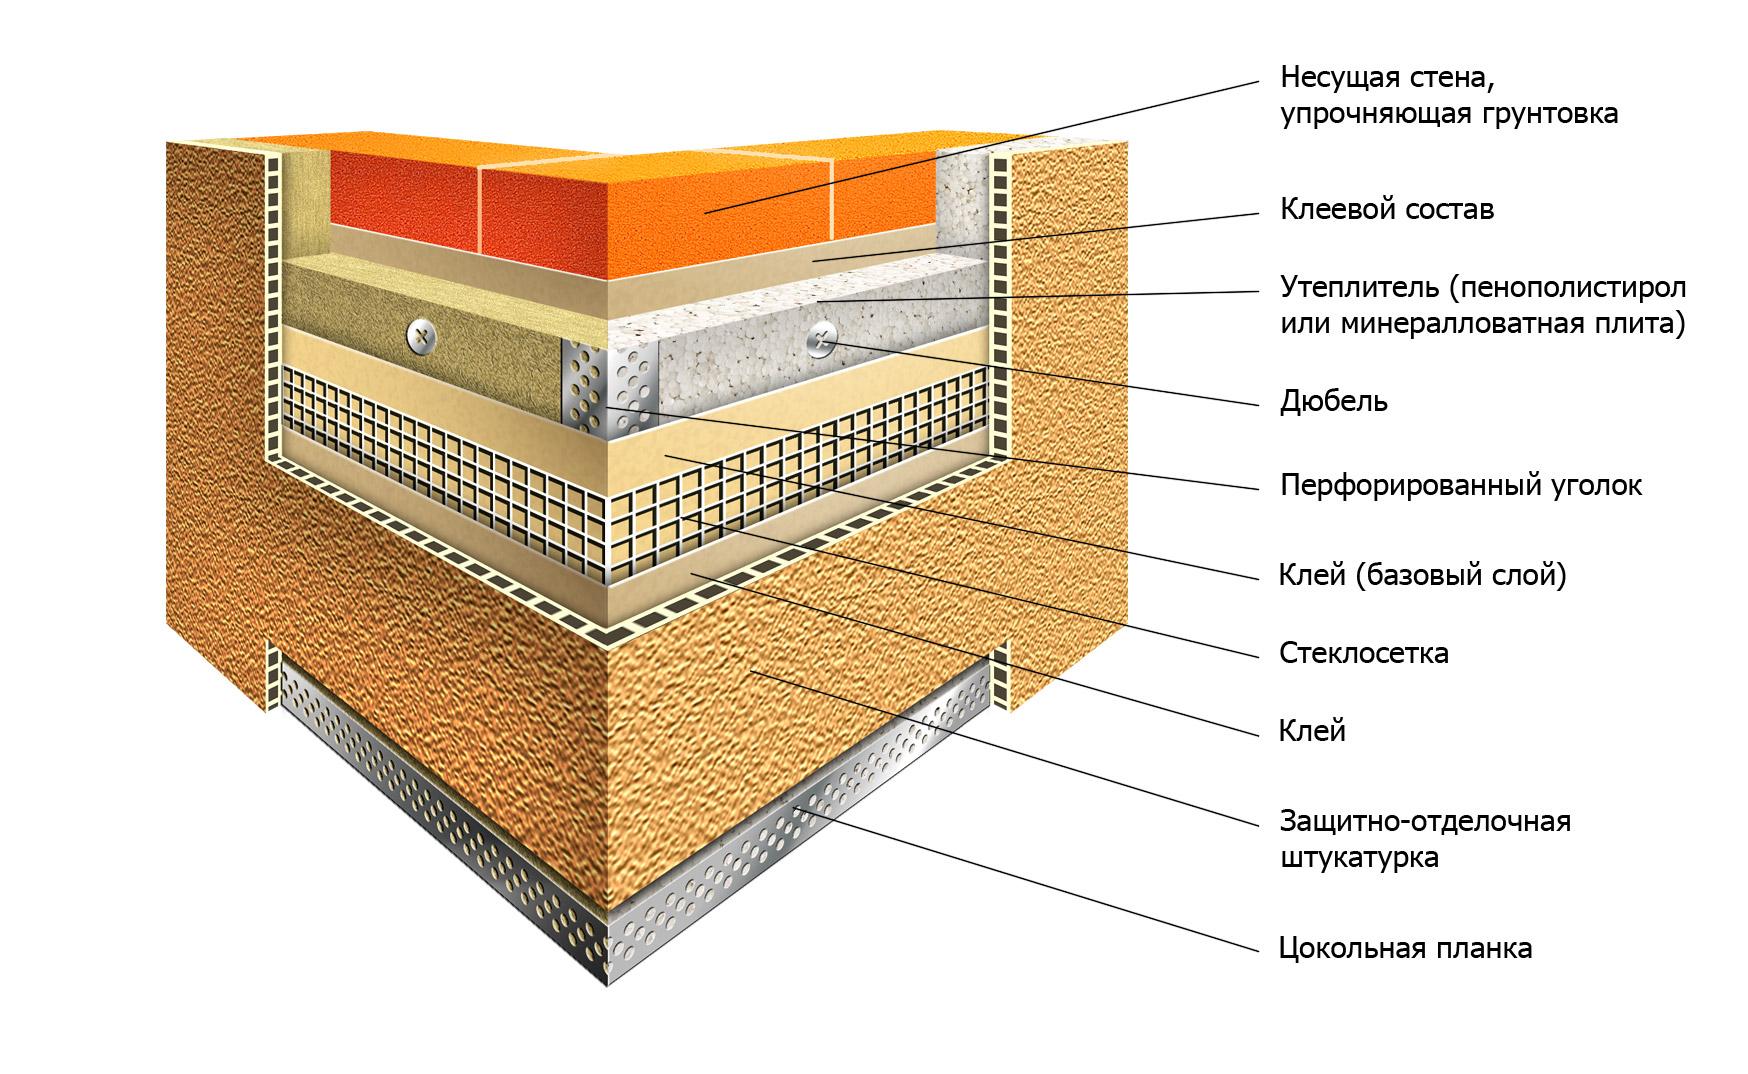 Утепление фасада дома: этапы, материалы, инструменты